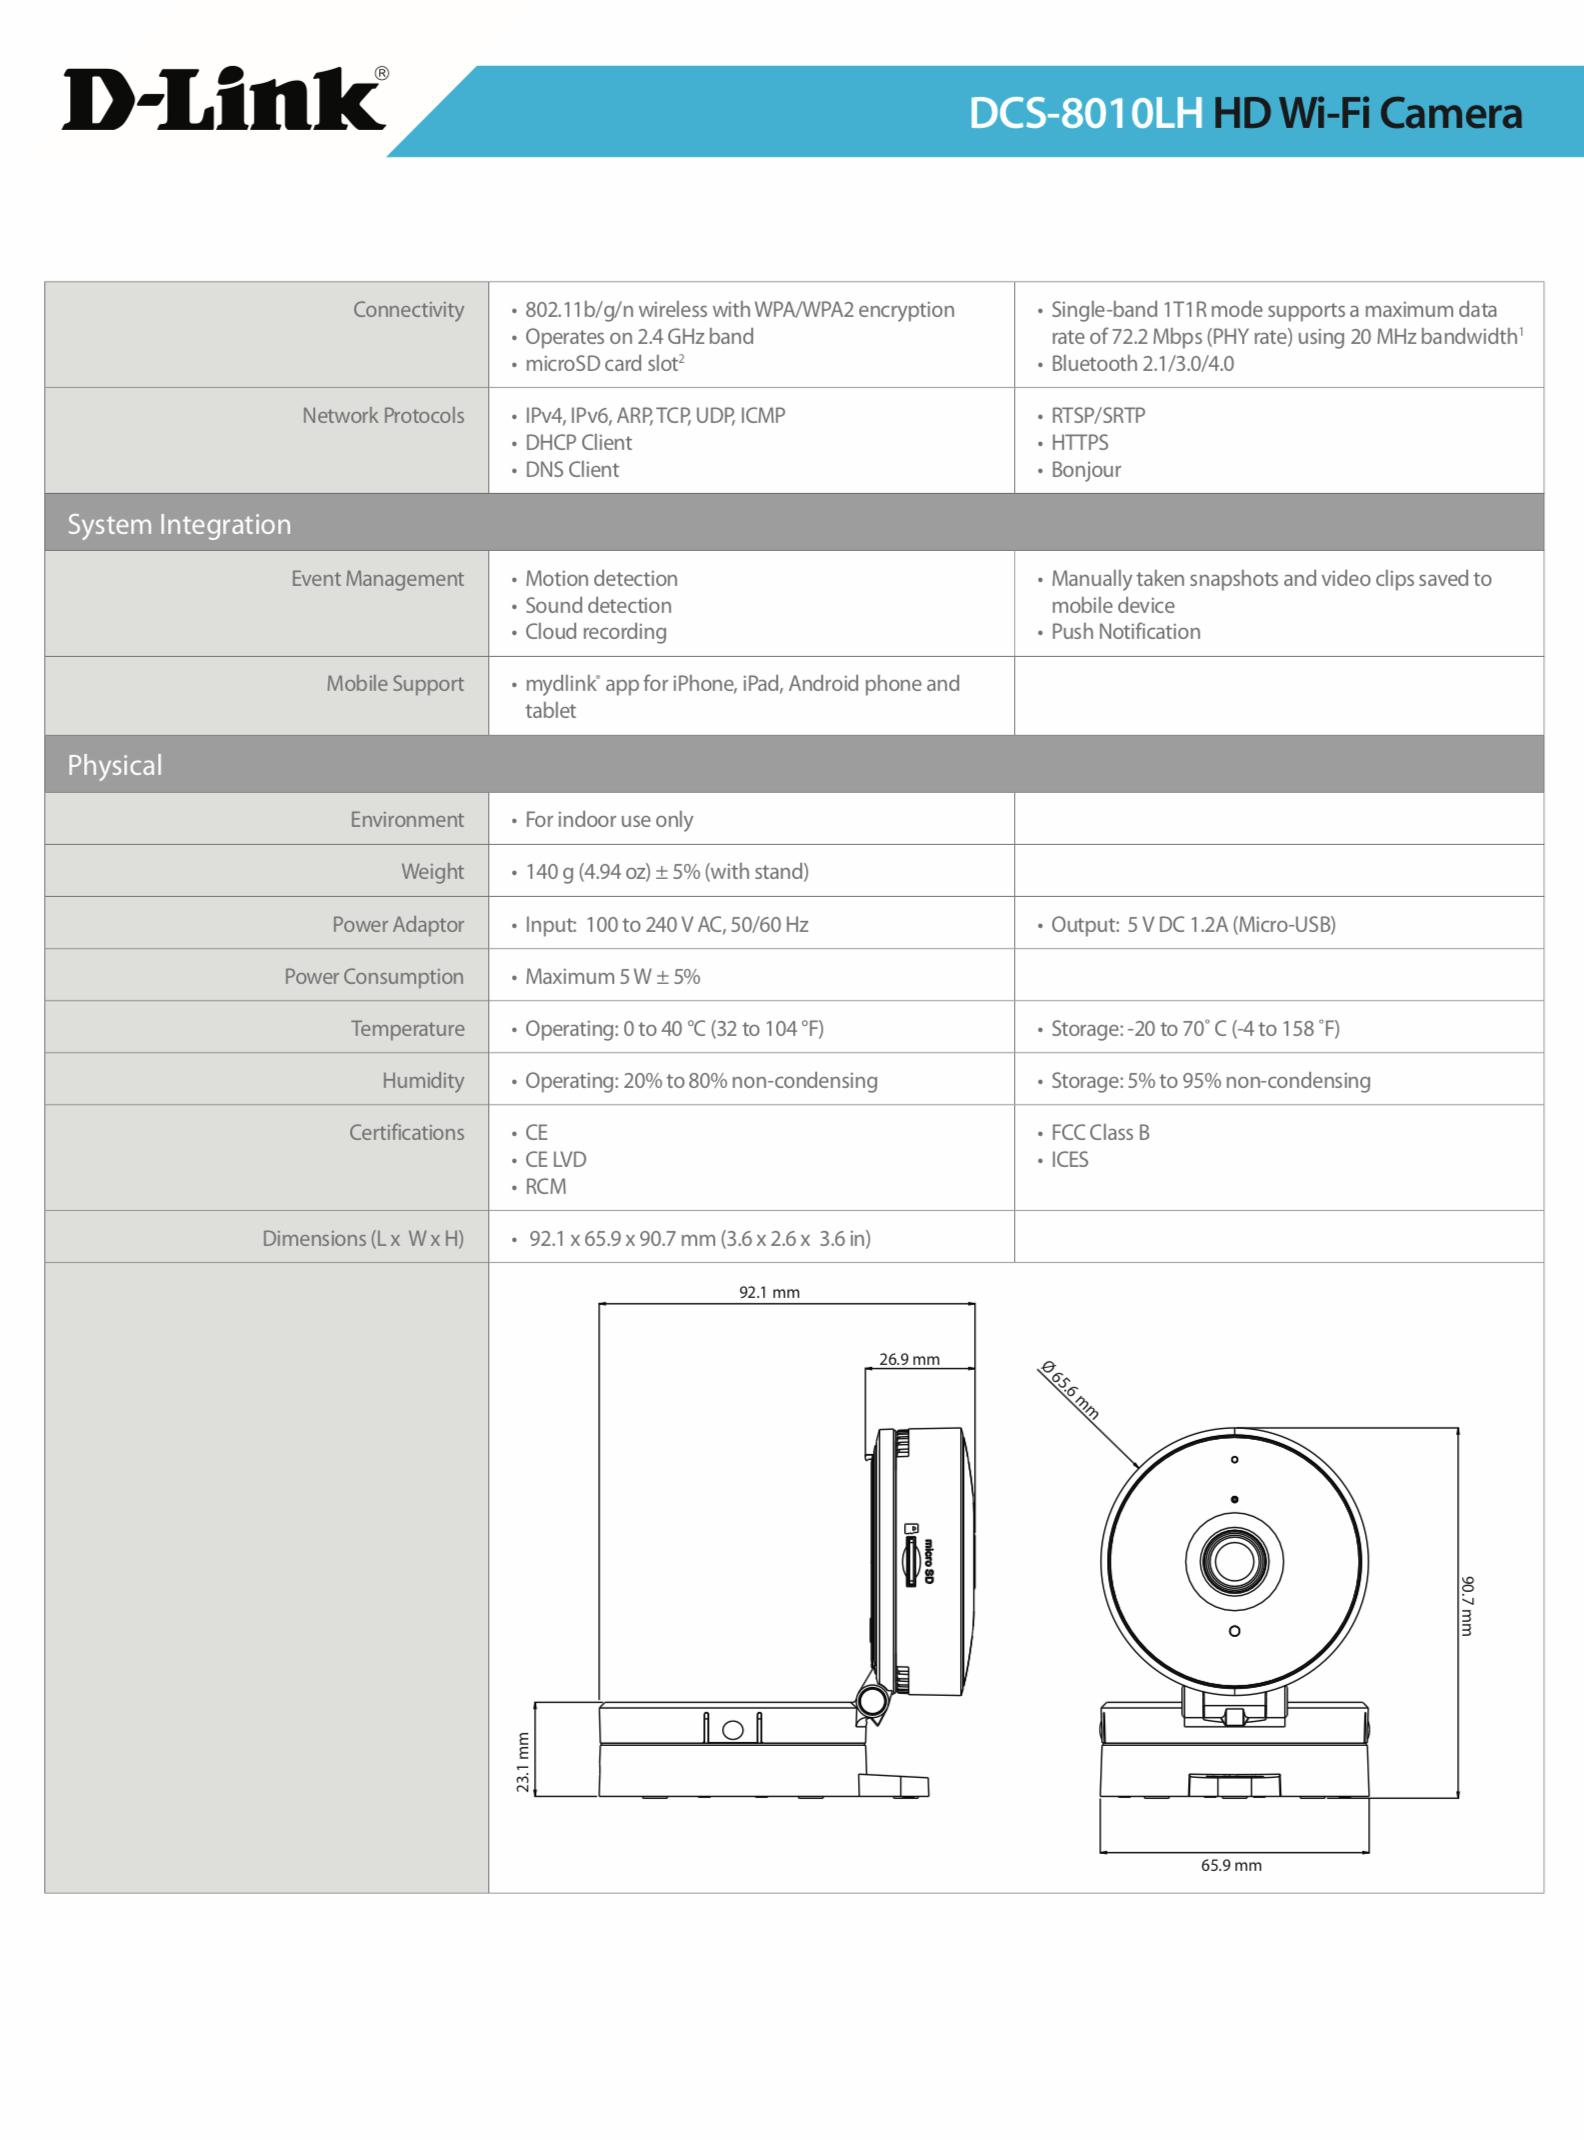 D-Link mydlink DCS-8010LH 1 Megapixel Network Camera - Monochrome, Color